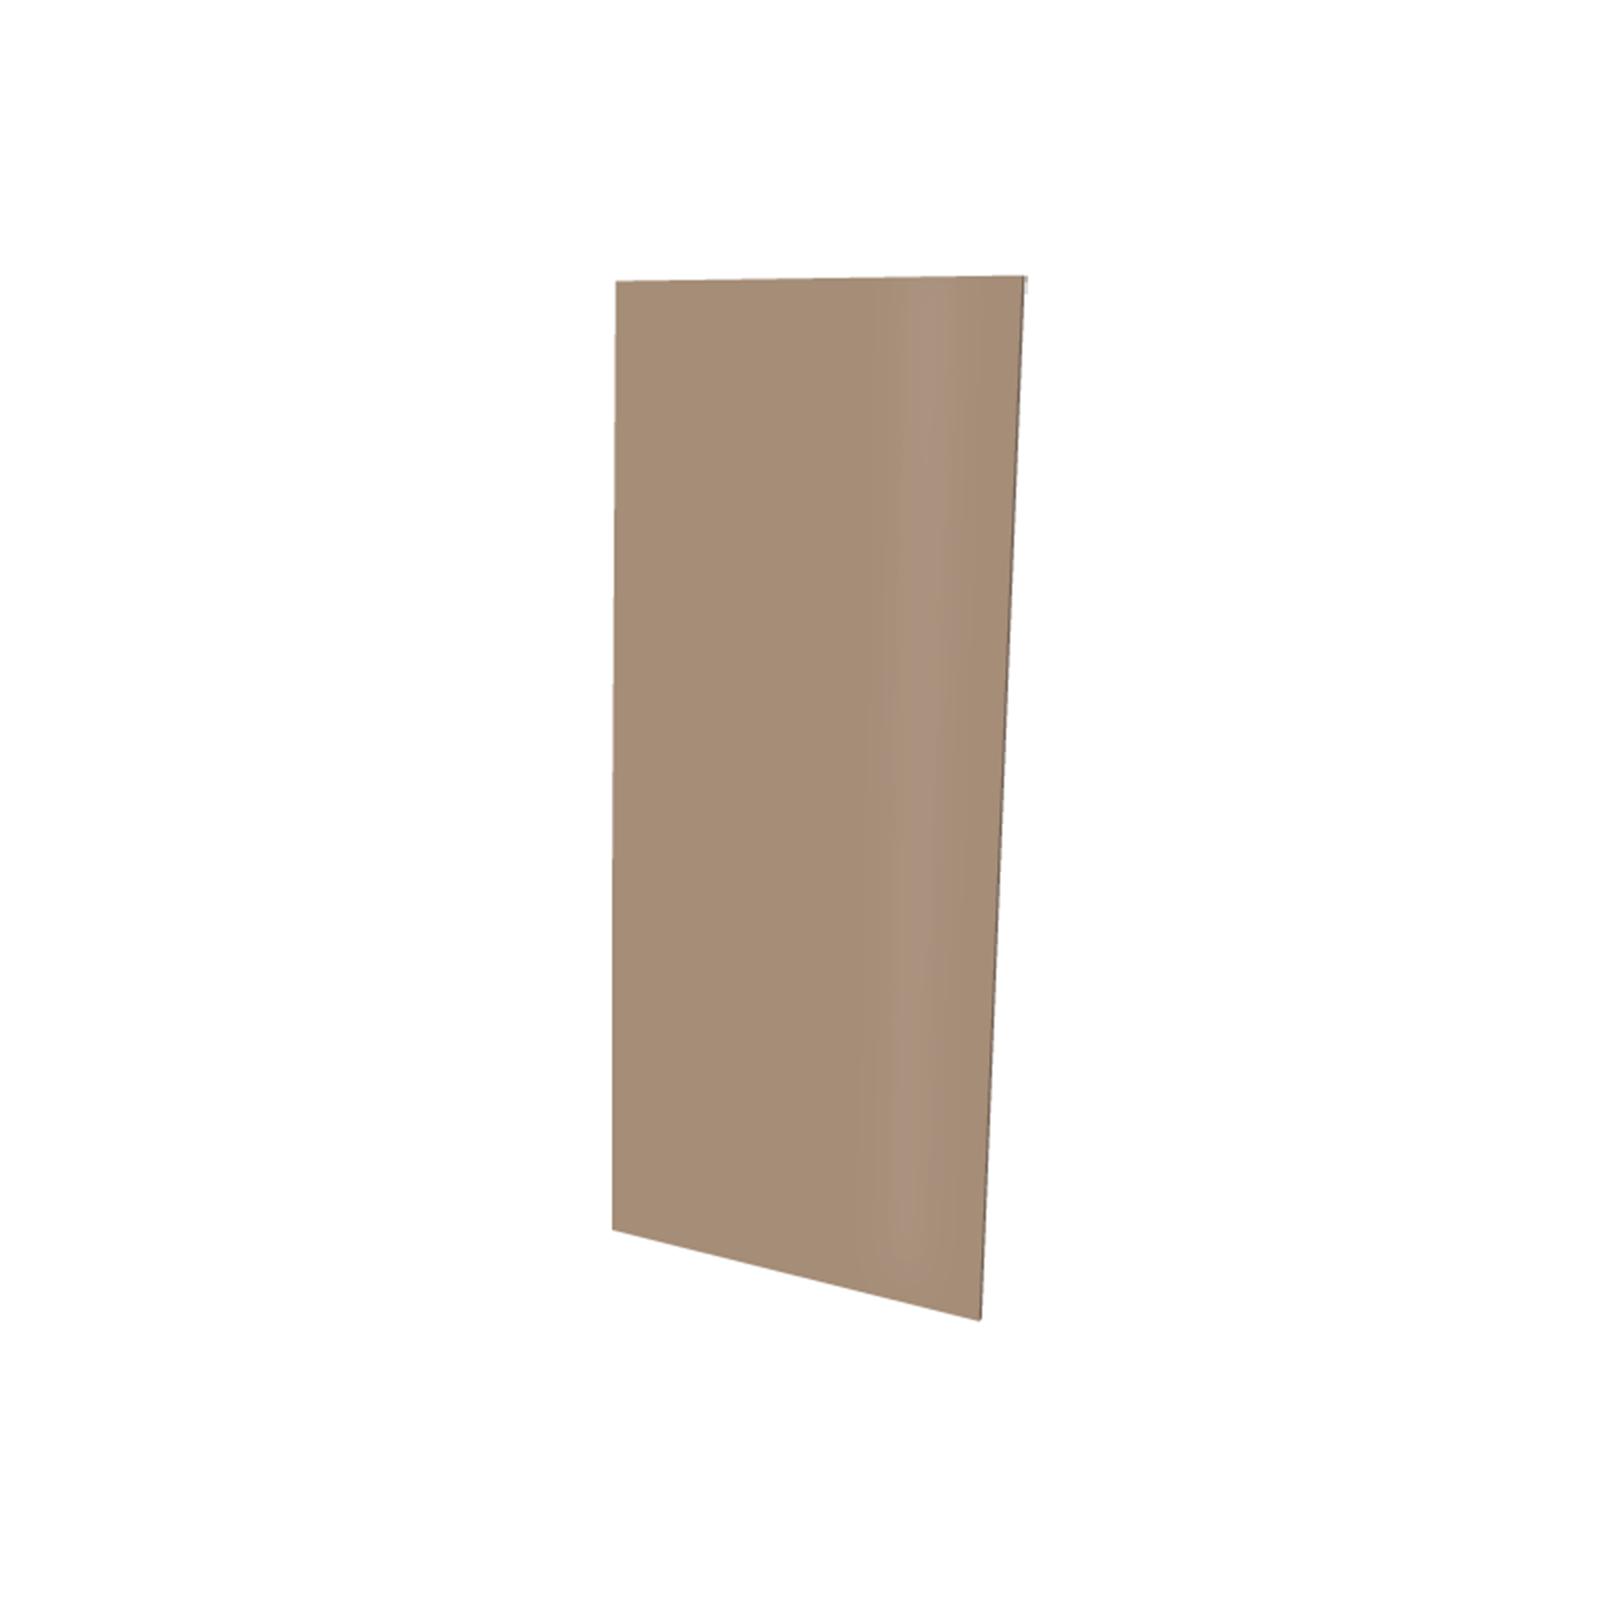 Vistelle 2070 x 900 x 4mm Tawny High Gloss Acrylic Bathroom Panel